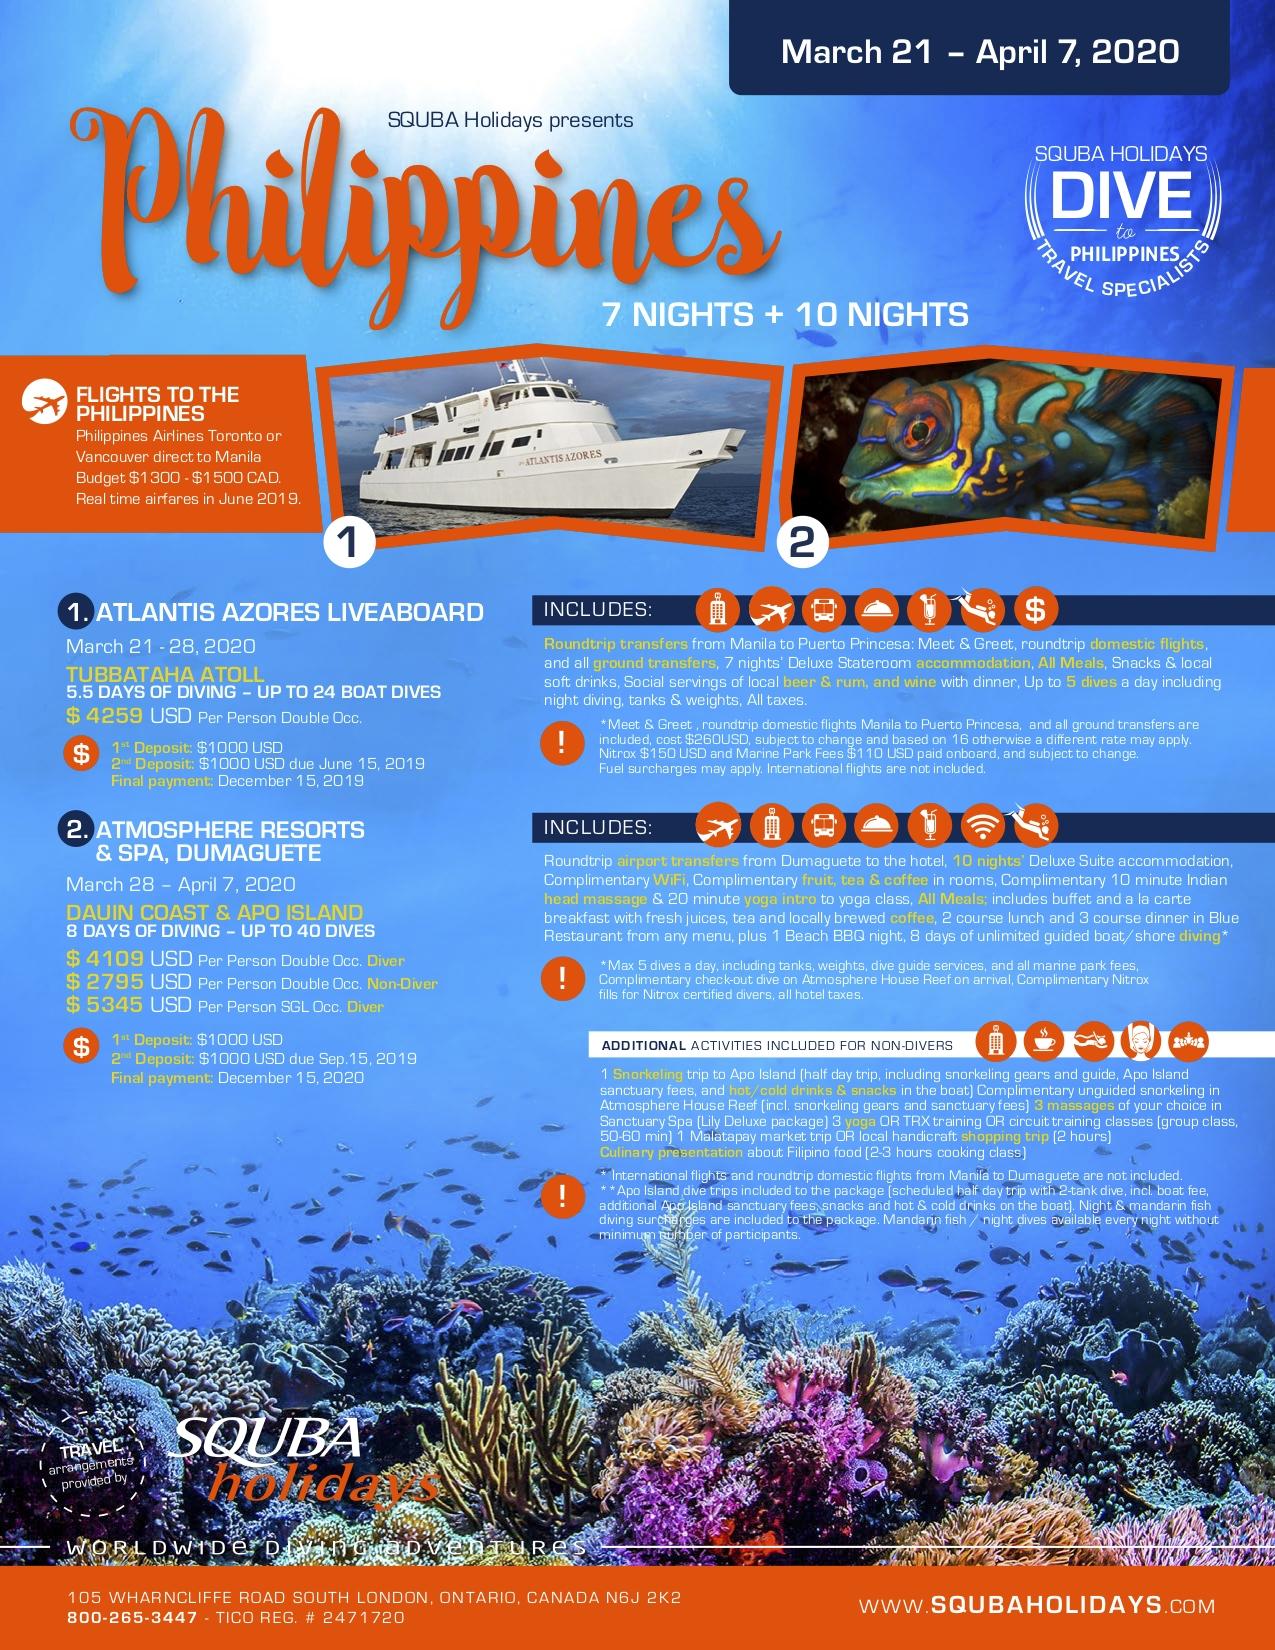 Scuba Holidays Philippines March-April 2020 | Scuba Holidays-Holidays To The Philipines In March 2020